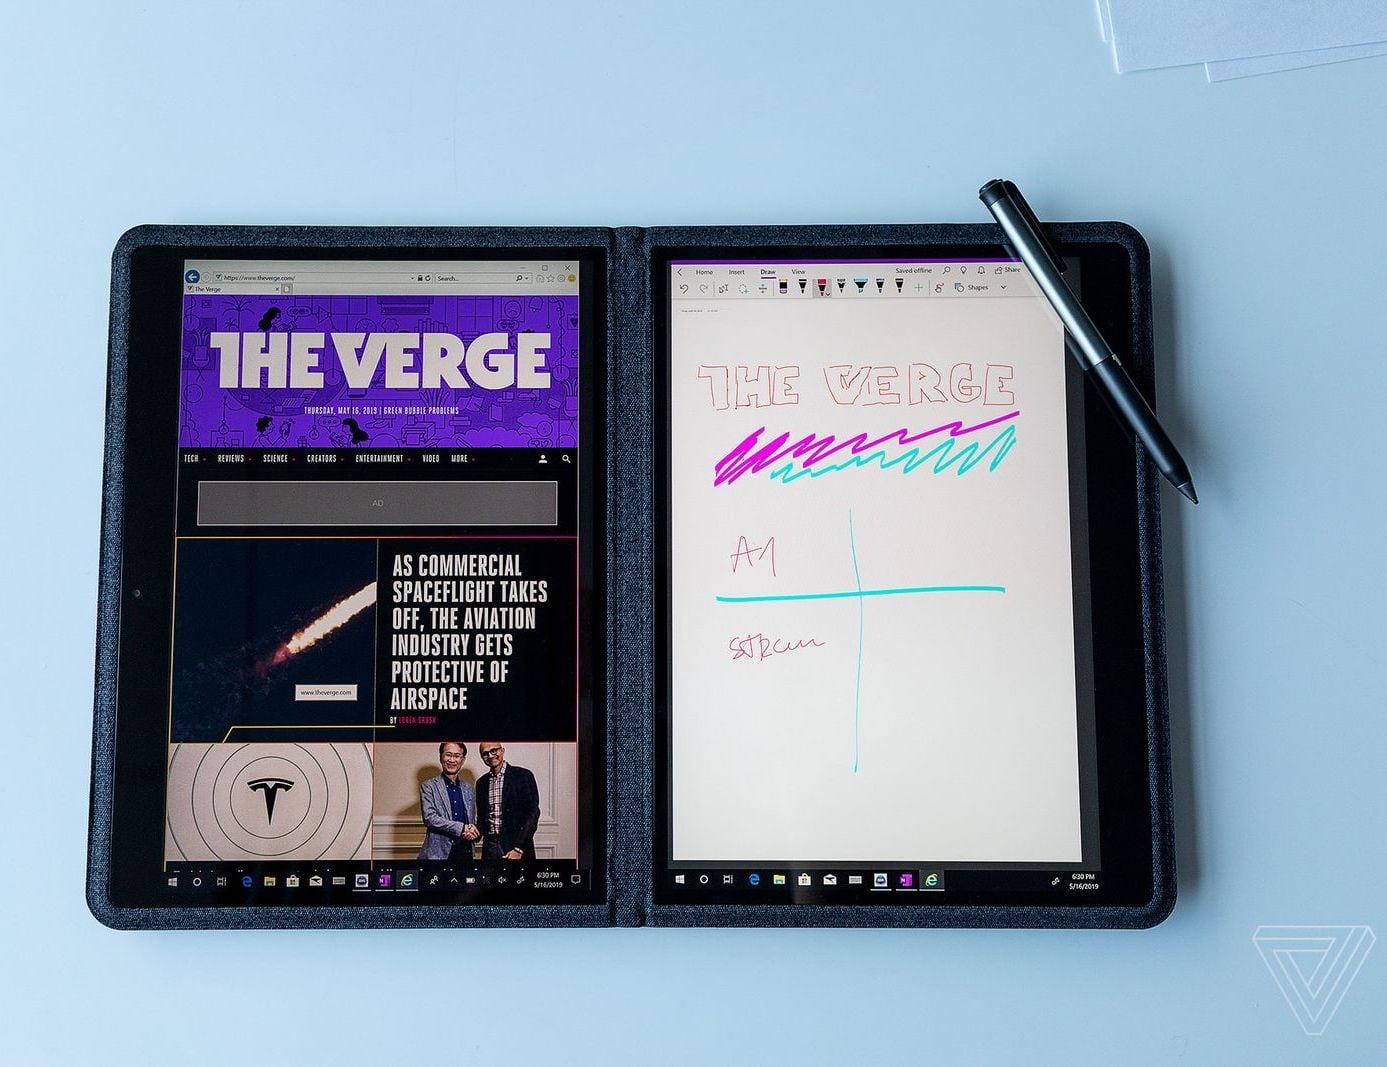 Intel Twin River Dual-Screen Fabric Laptop sports a sleek, flexible design